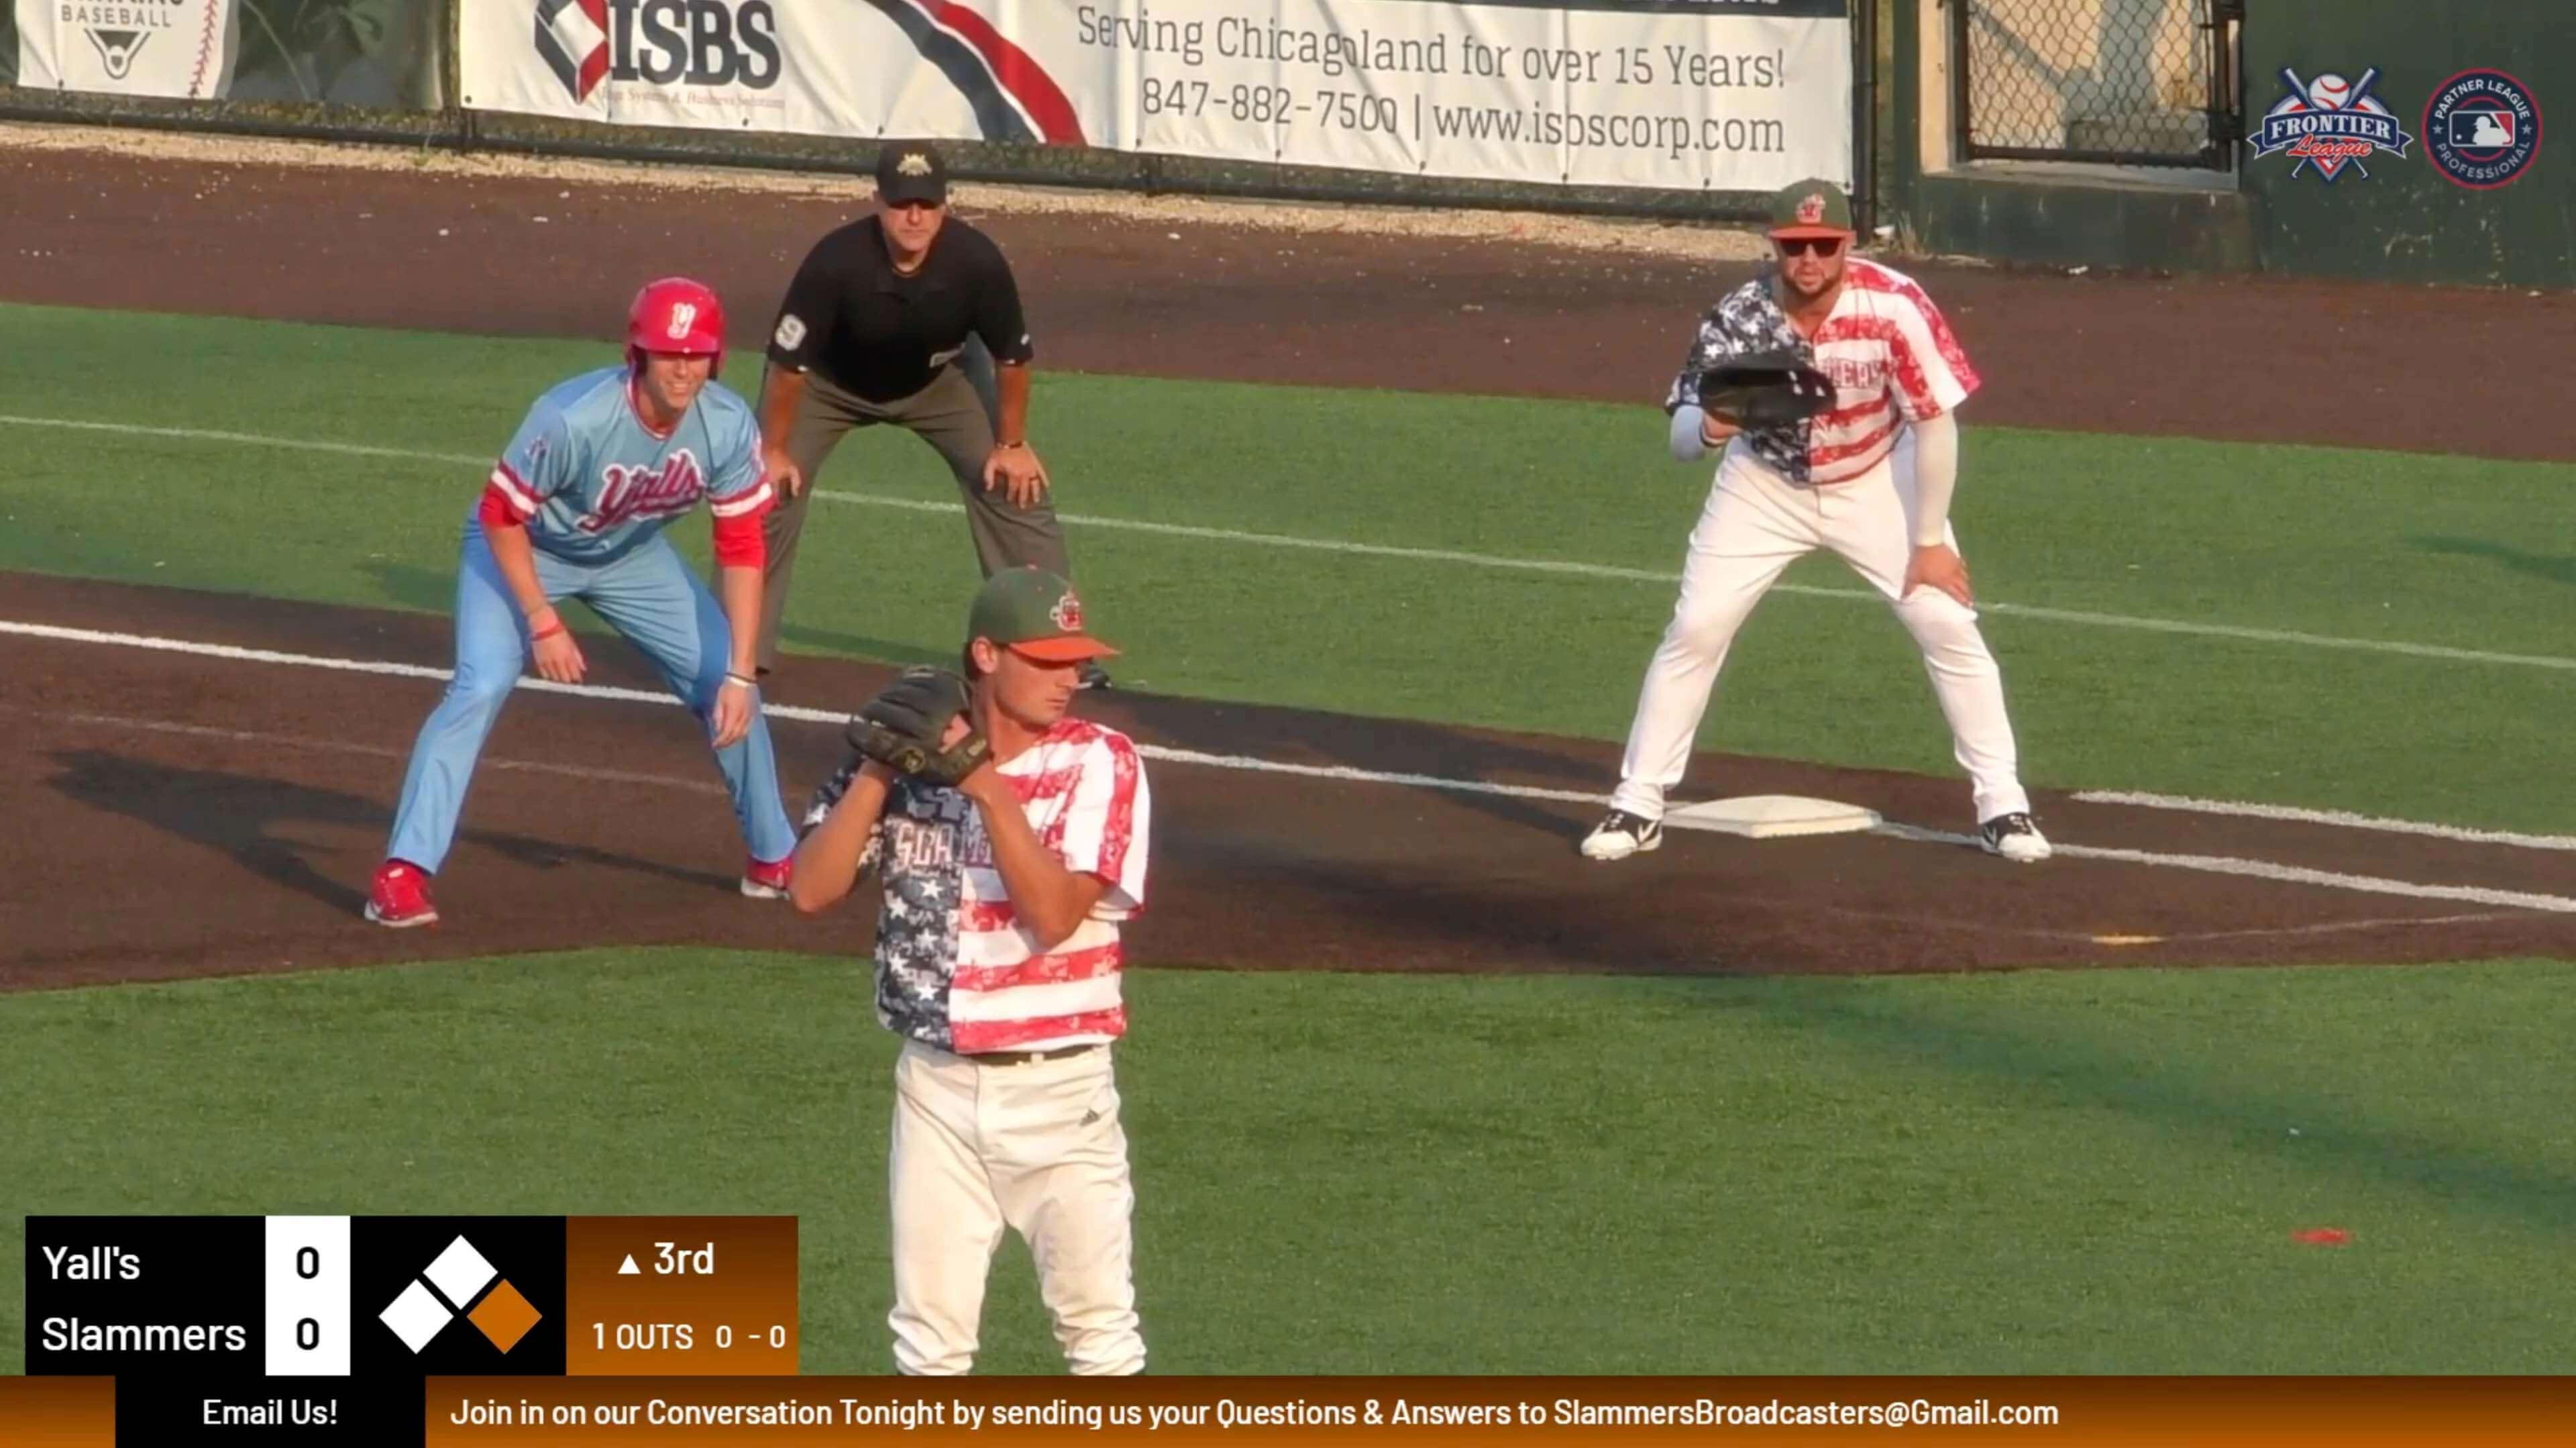 The Joliet Slammers - A Minor League Team with Major League Broadcasts